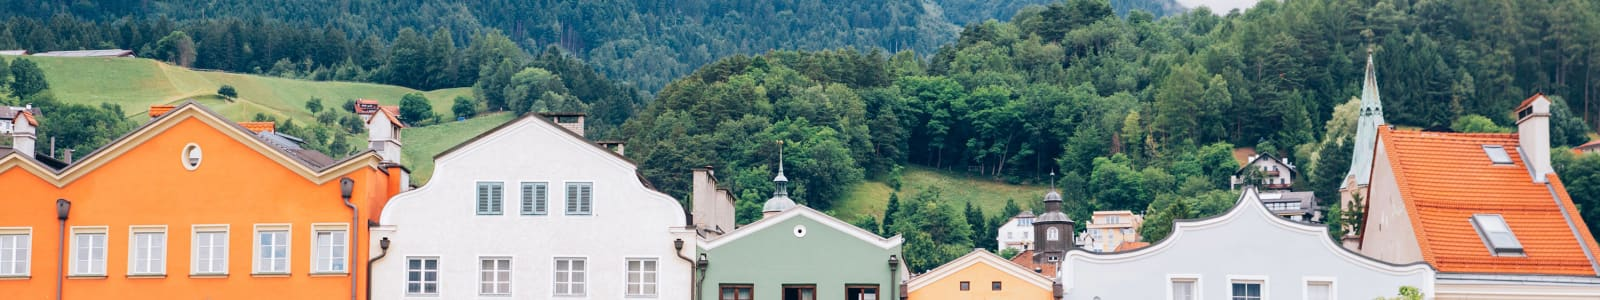 Innsbruck's colourful buildings